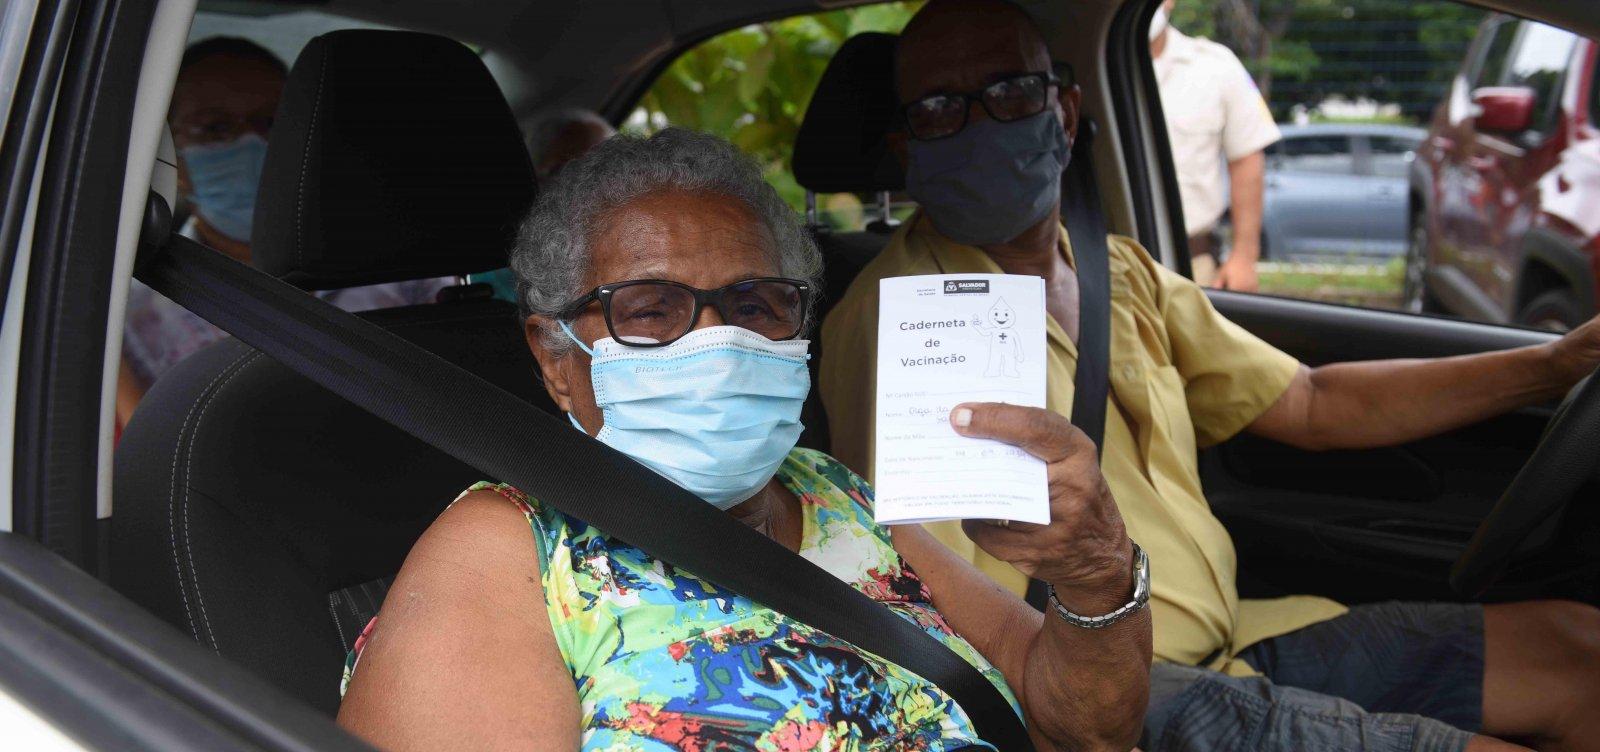 Salvador ultrapassa marca de 100 mil pessoas vacinadas contra a Covid-19